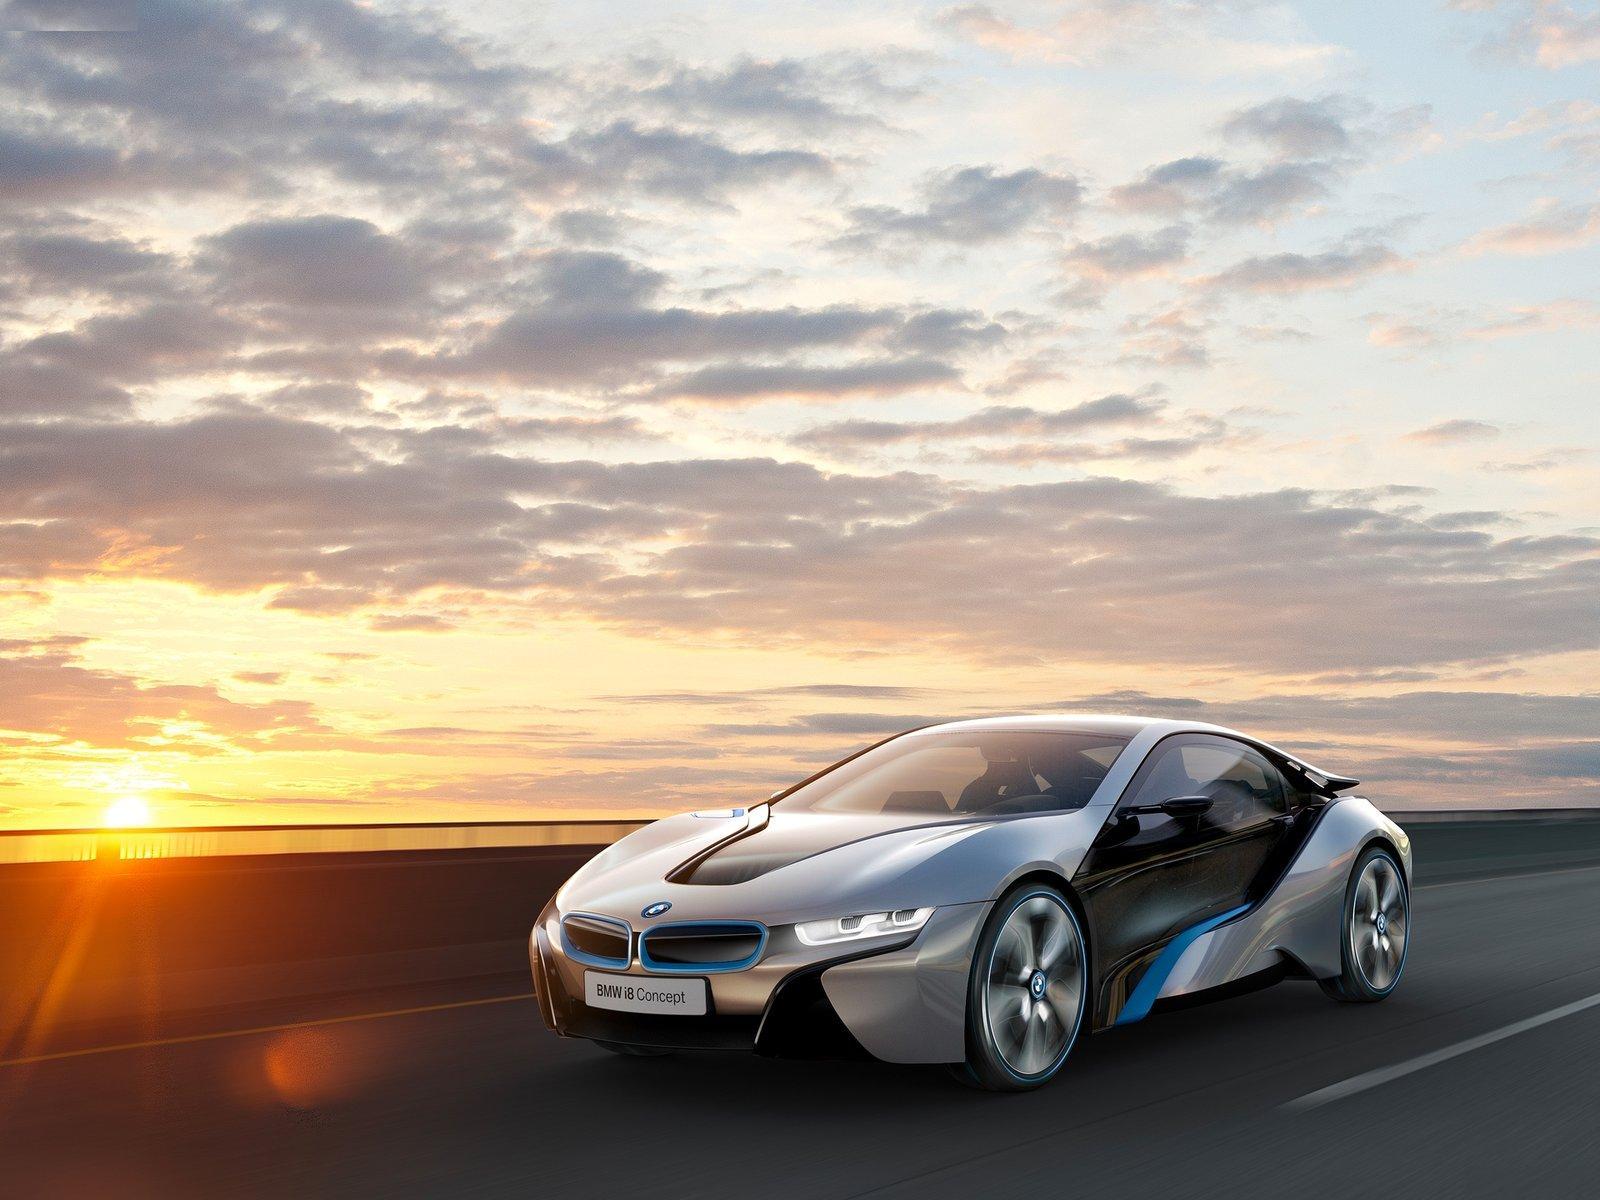 بالصور اريد صور سيارات , اجمل صور للسيارات